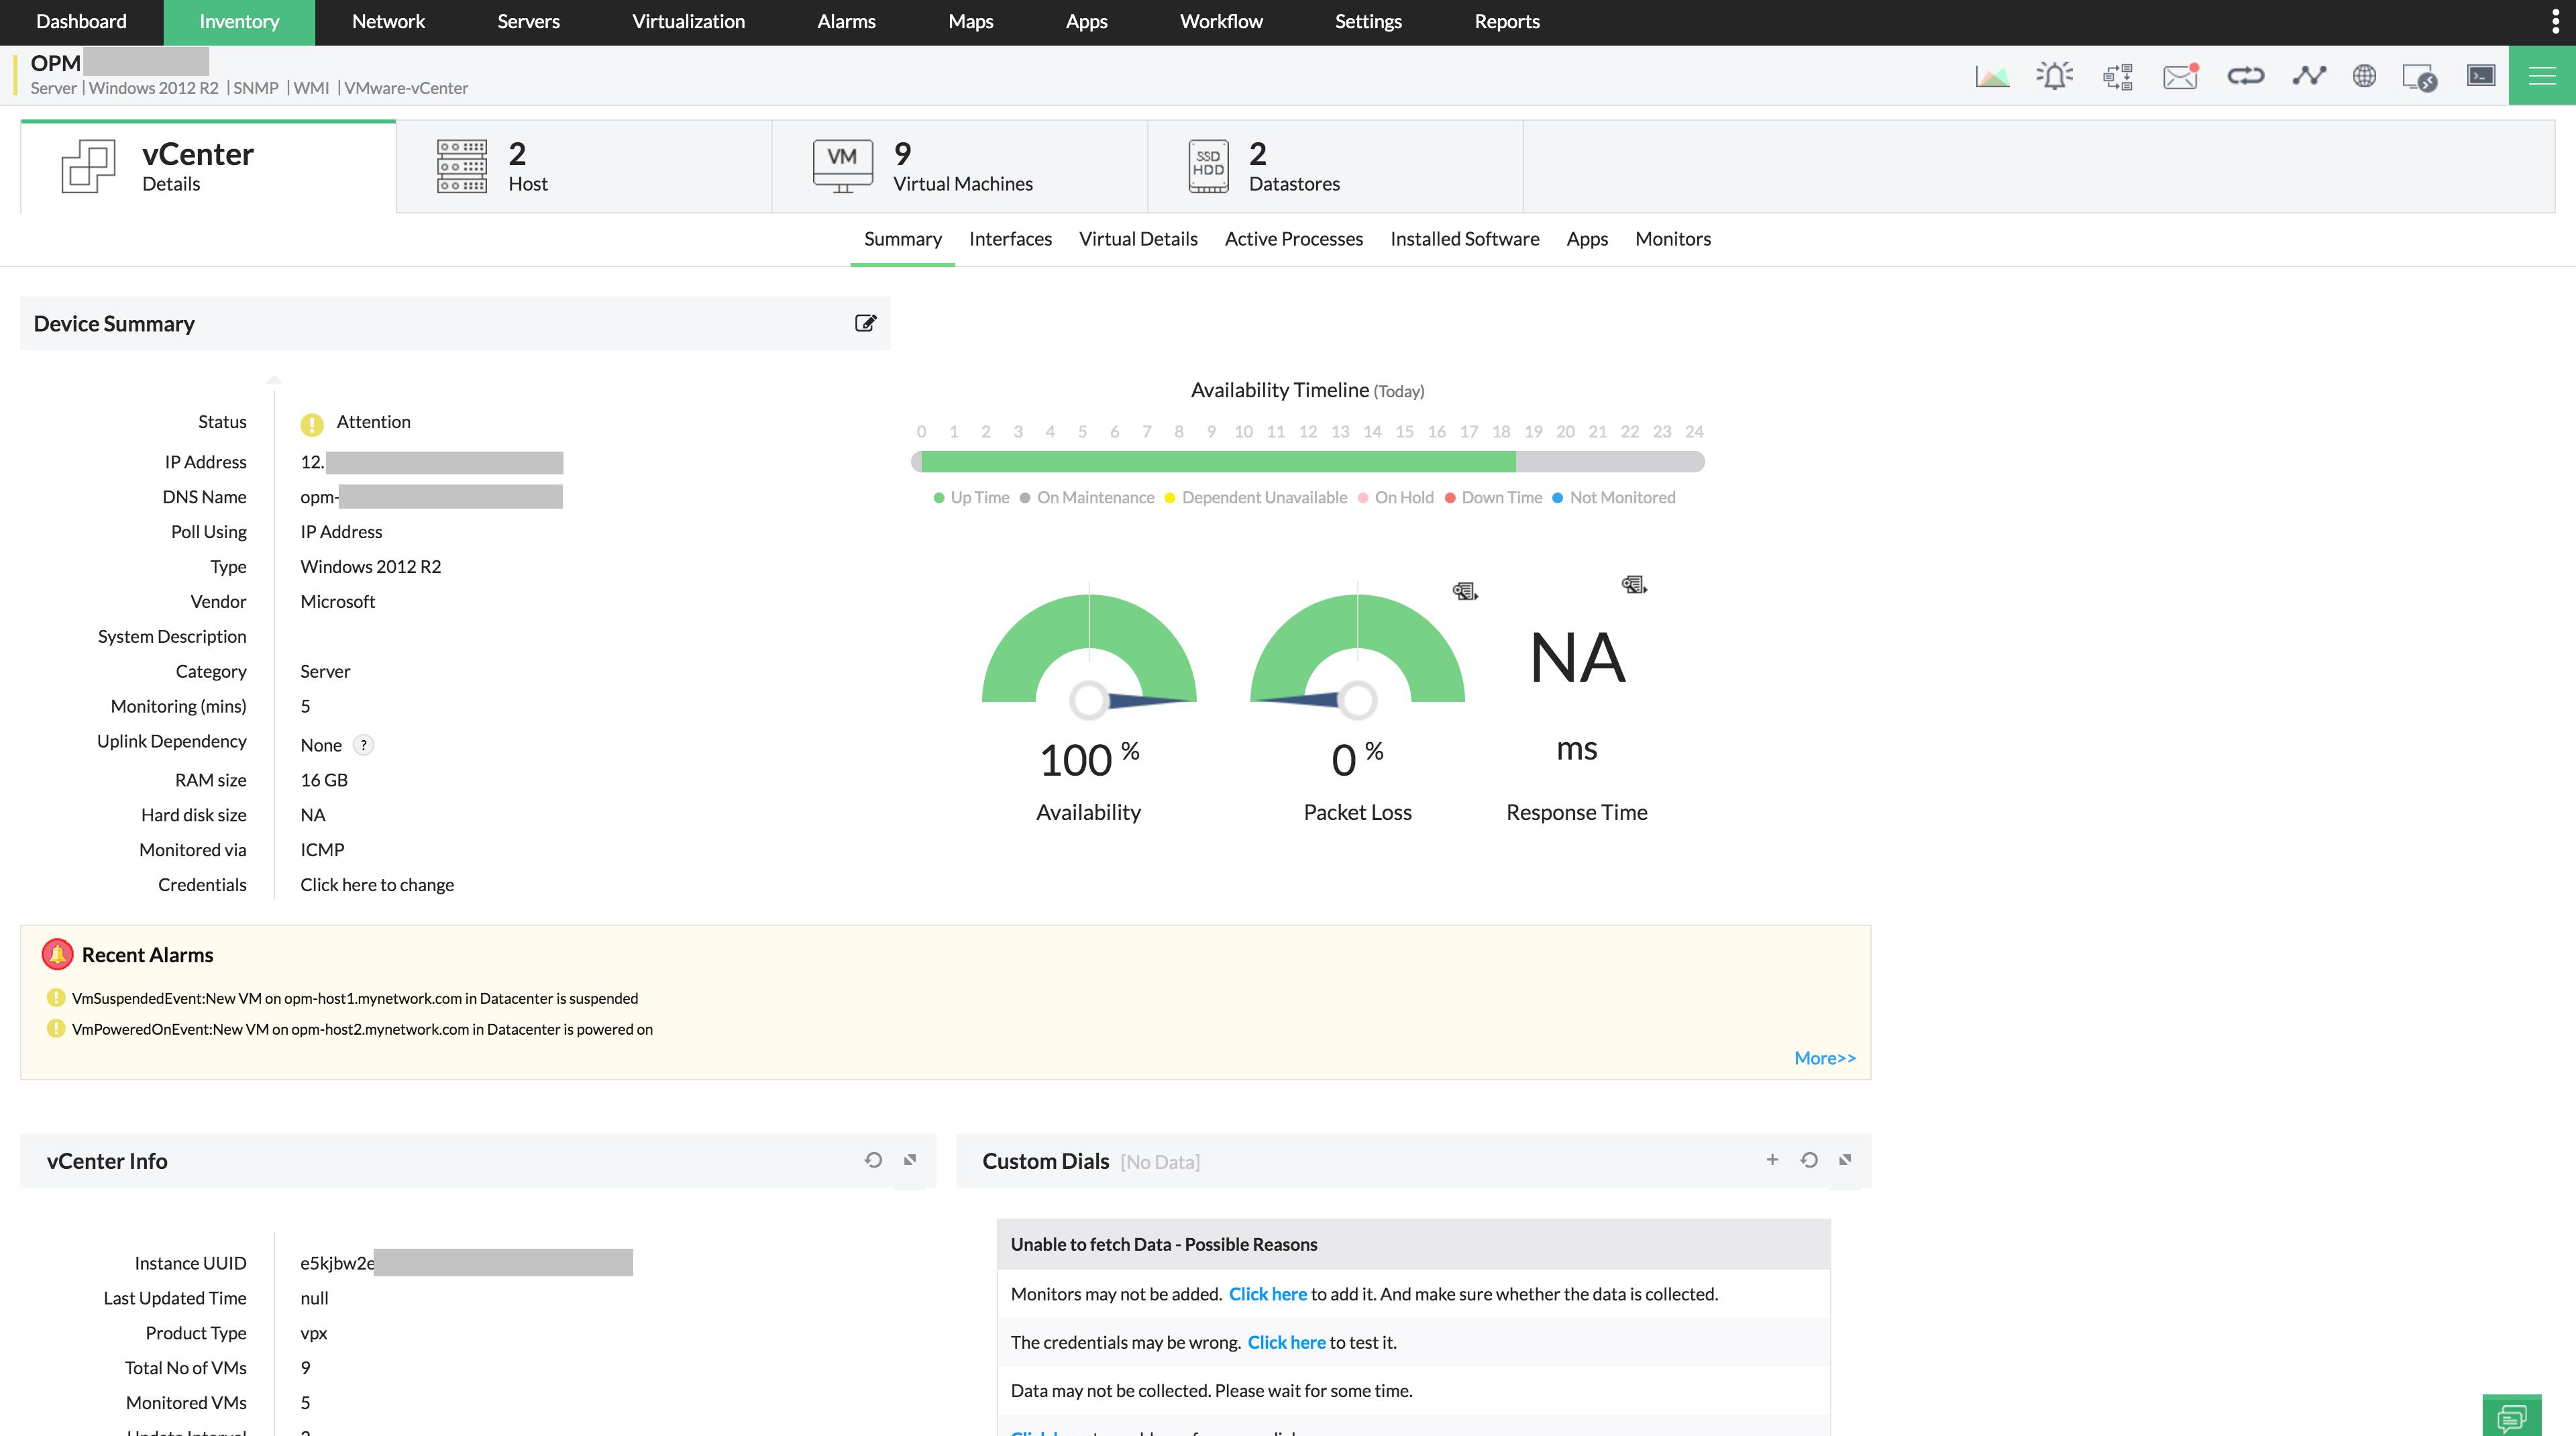 vSphere Monitoring & Performance